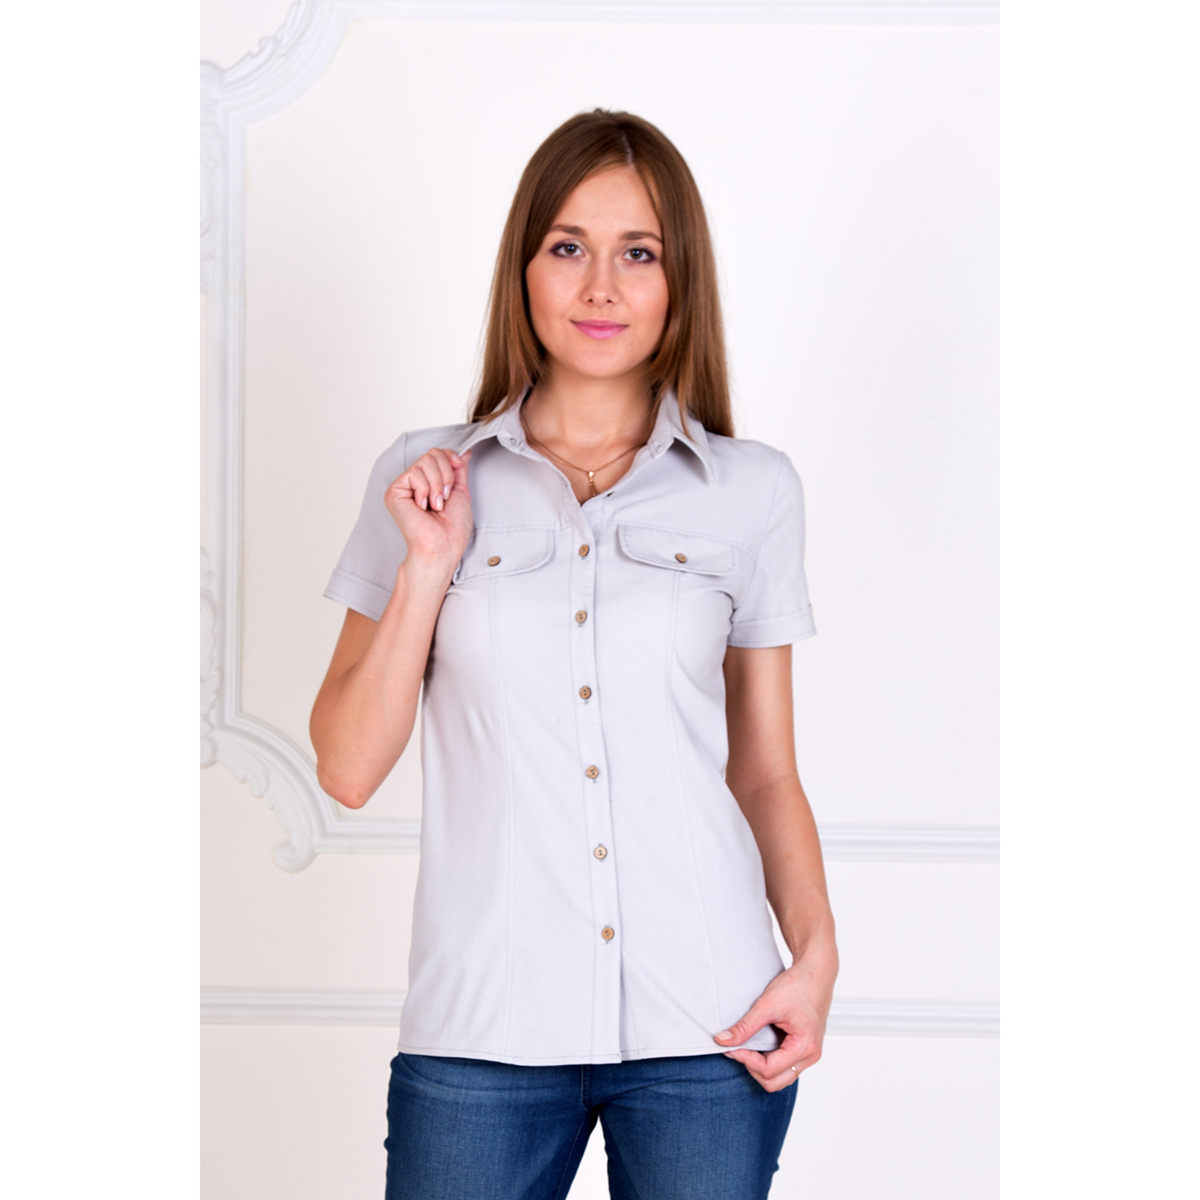 Женская рубашка Александра Серый, размер 40Рубашки<br>Обхват груди: 80 см <br>Обхват талии: 62 см <br>Обхват бедер: 88 см <br>Рост: 167 см<br><br>Тип: Жен. рубашка<br>Размер: 40<br>Материал: Хлопок